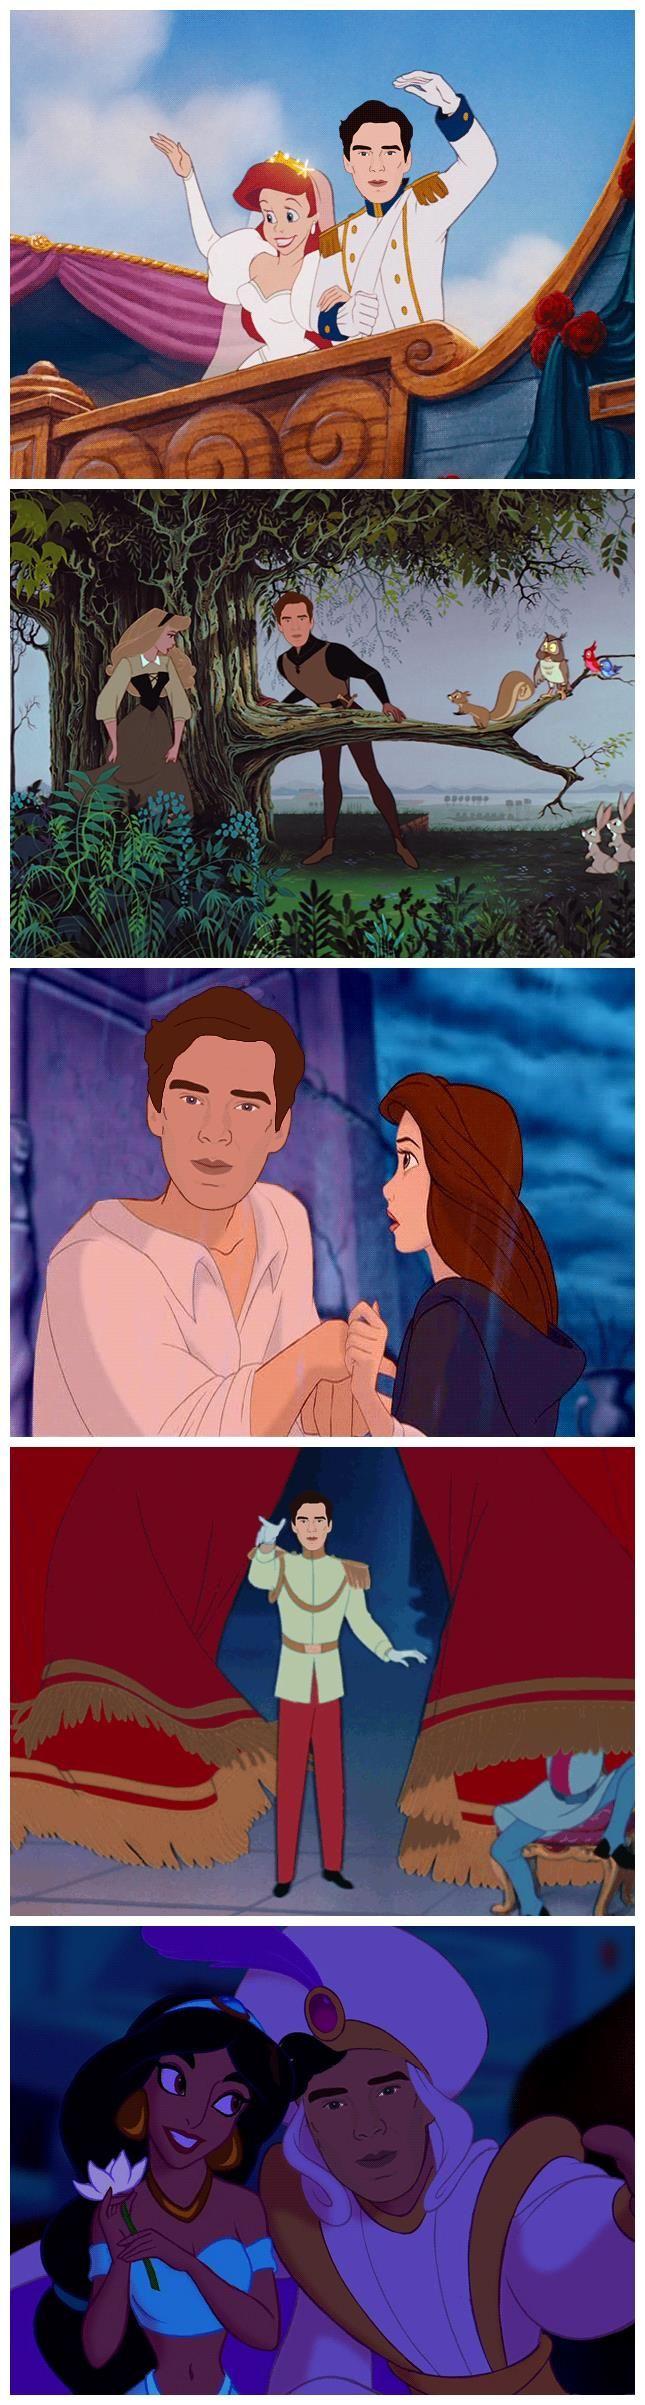 Benedict Cumberbatch As Disney Princes. I don't know if the fandom will make it until next season.....